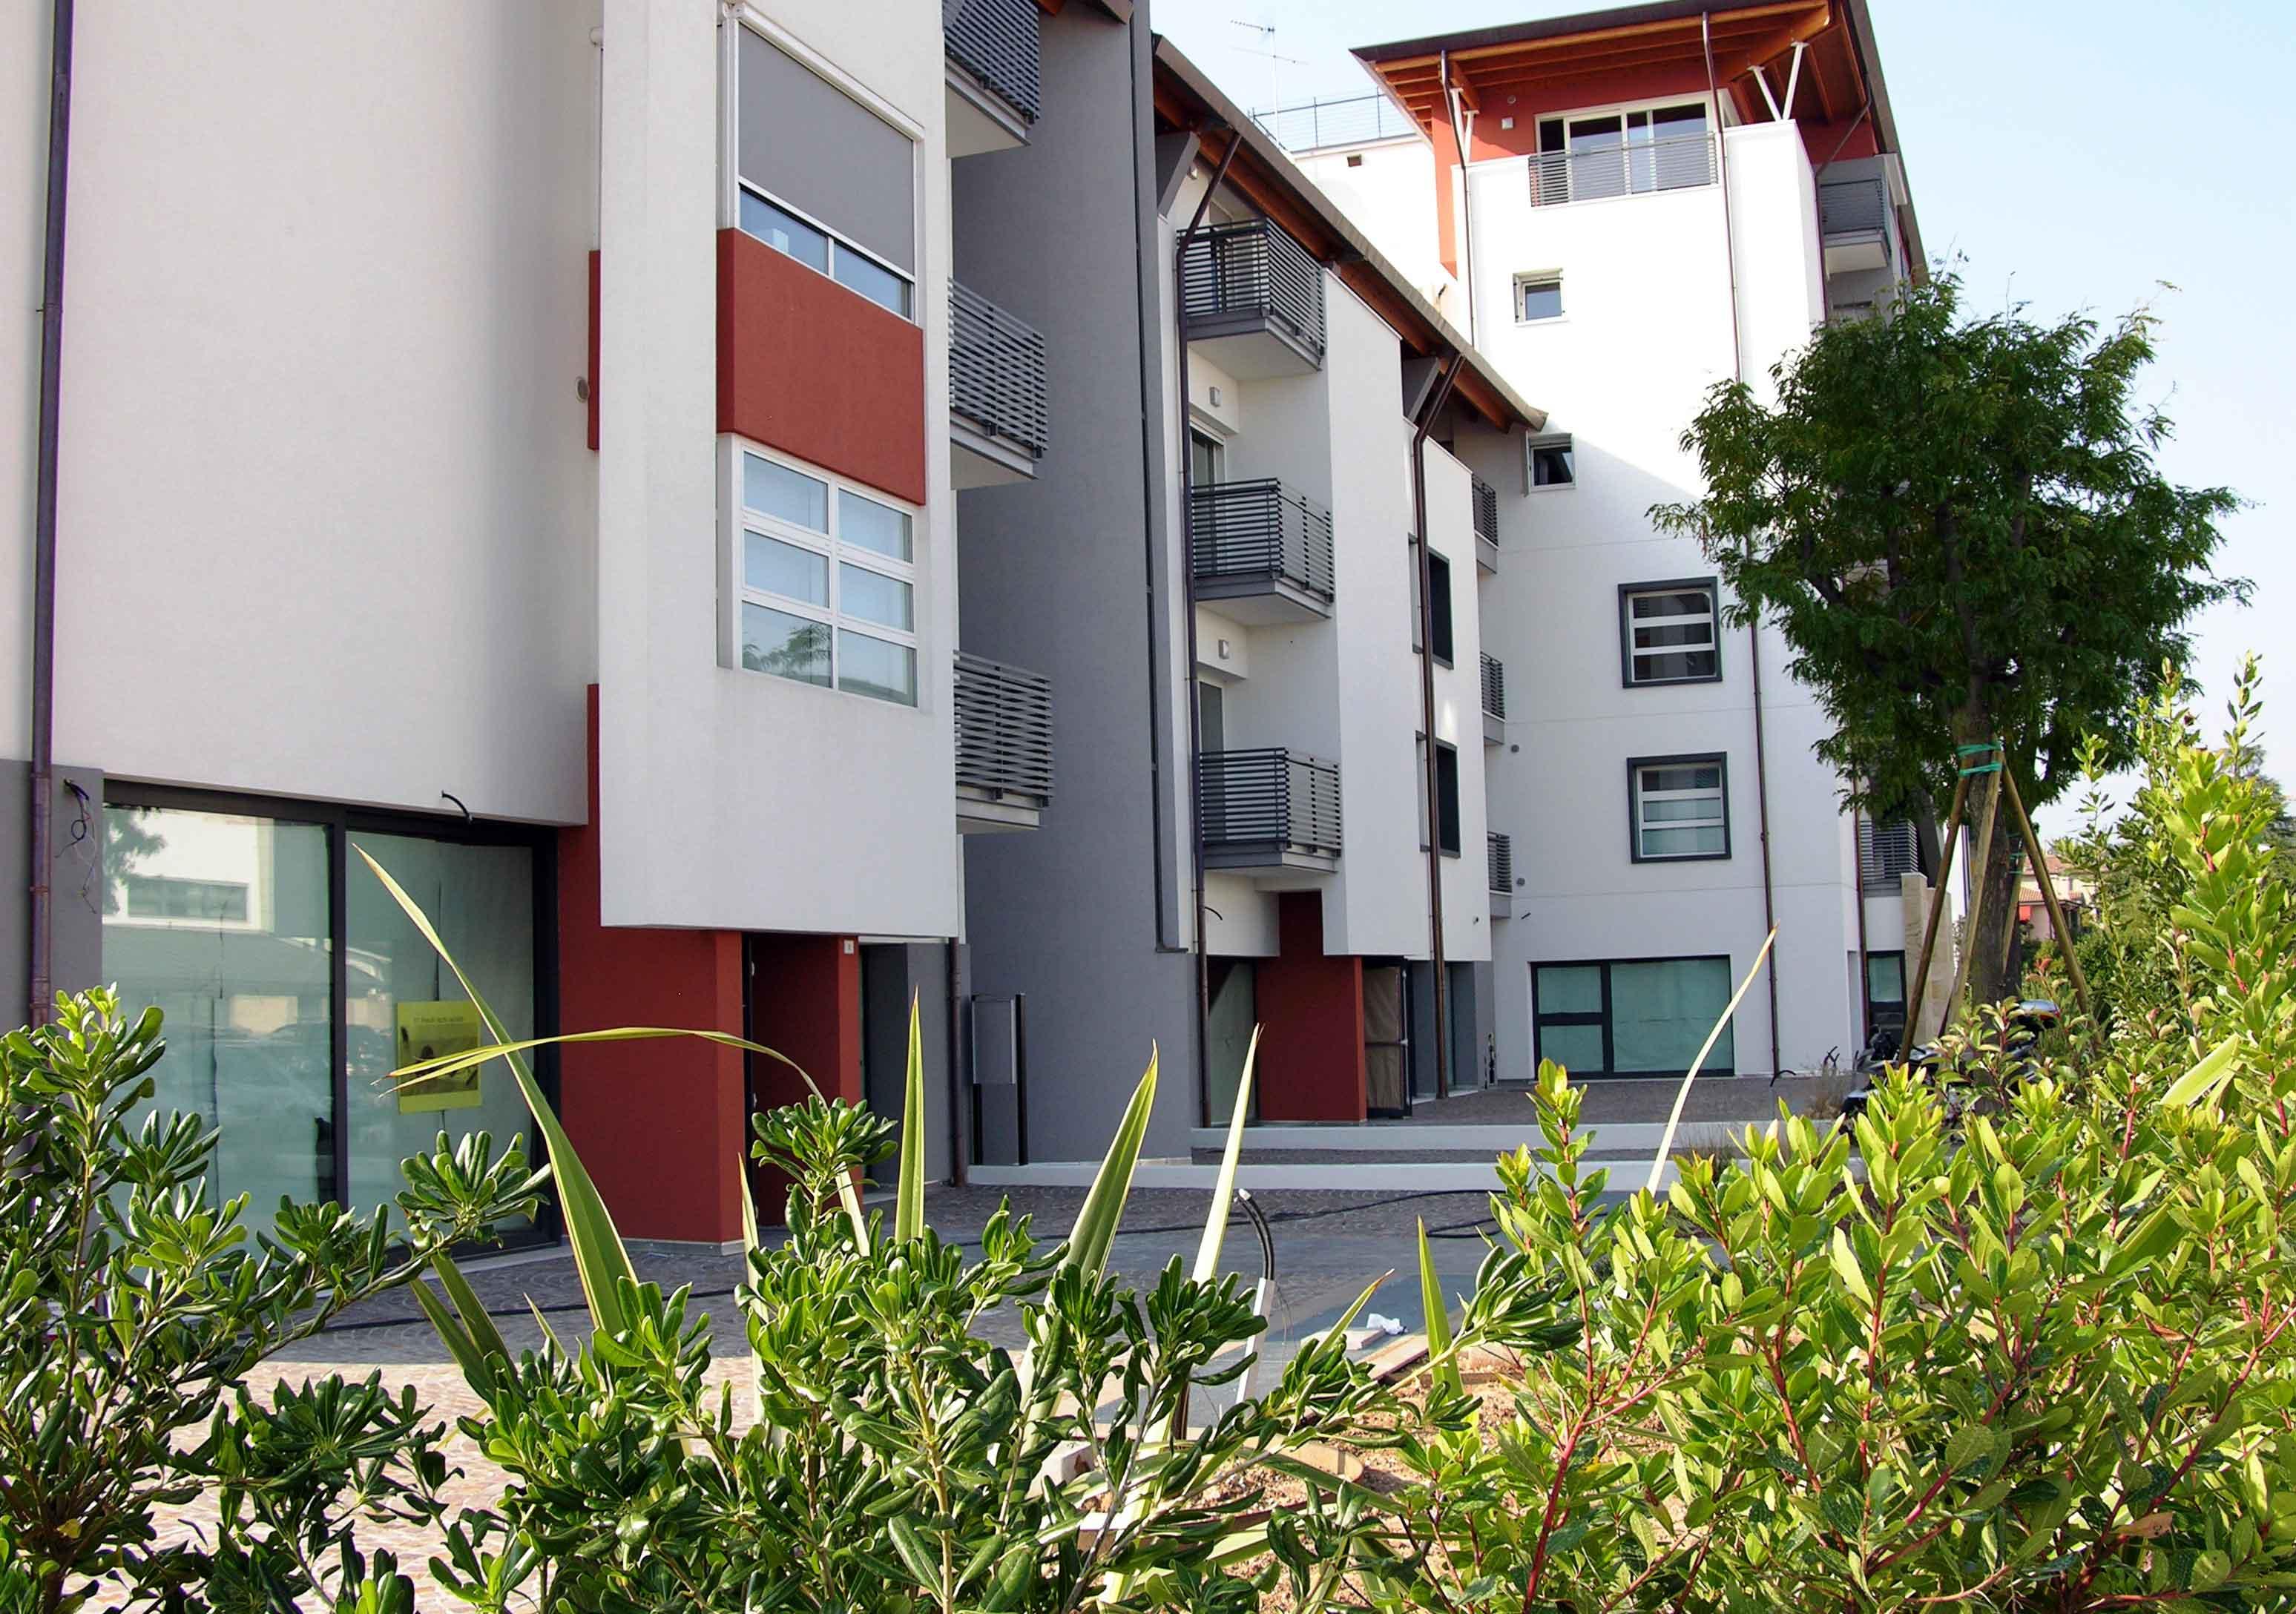 Immobiliare Diva – Montebelluna ce8d54126c3